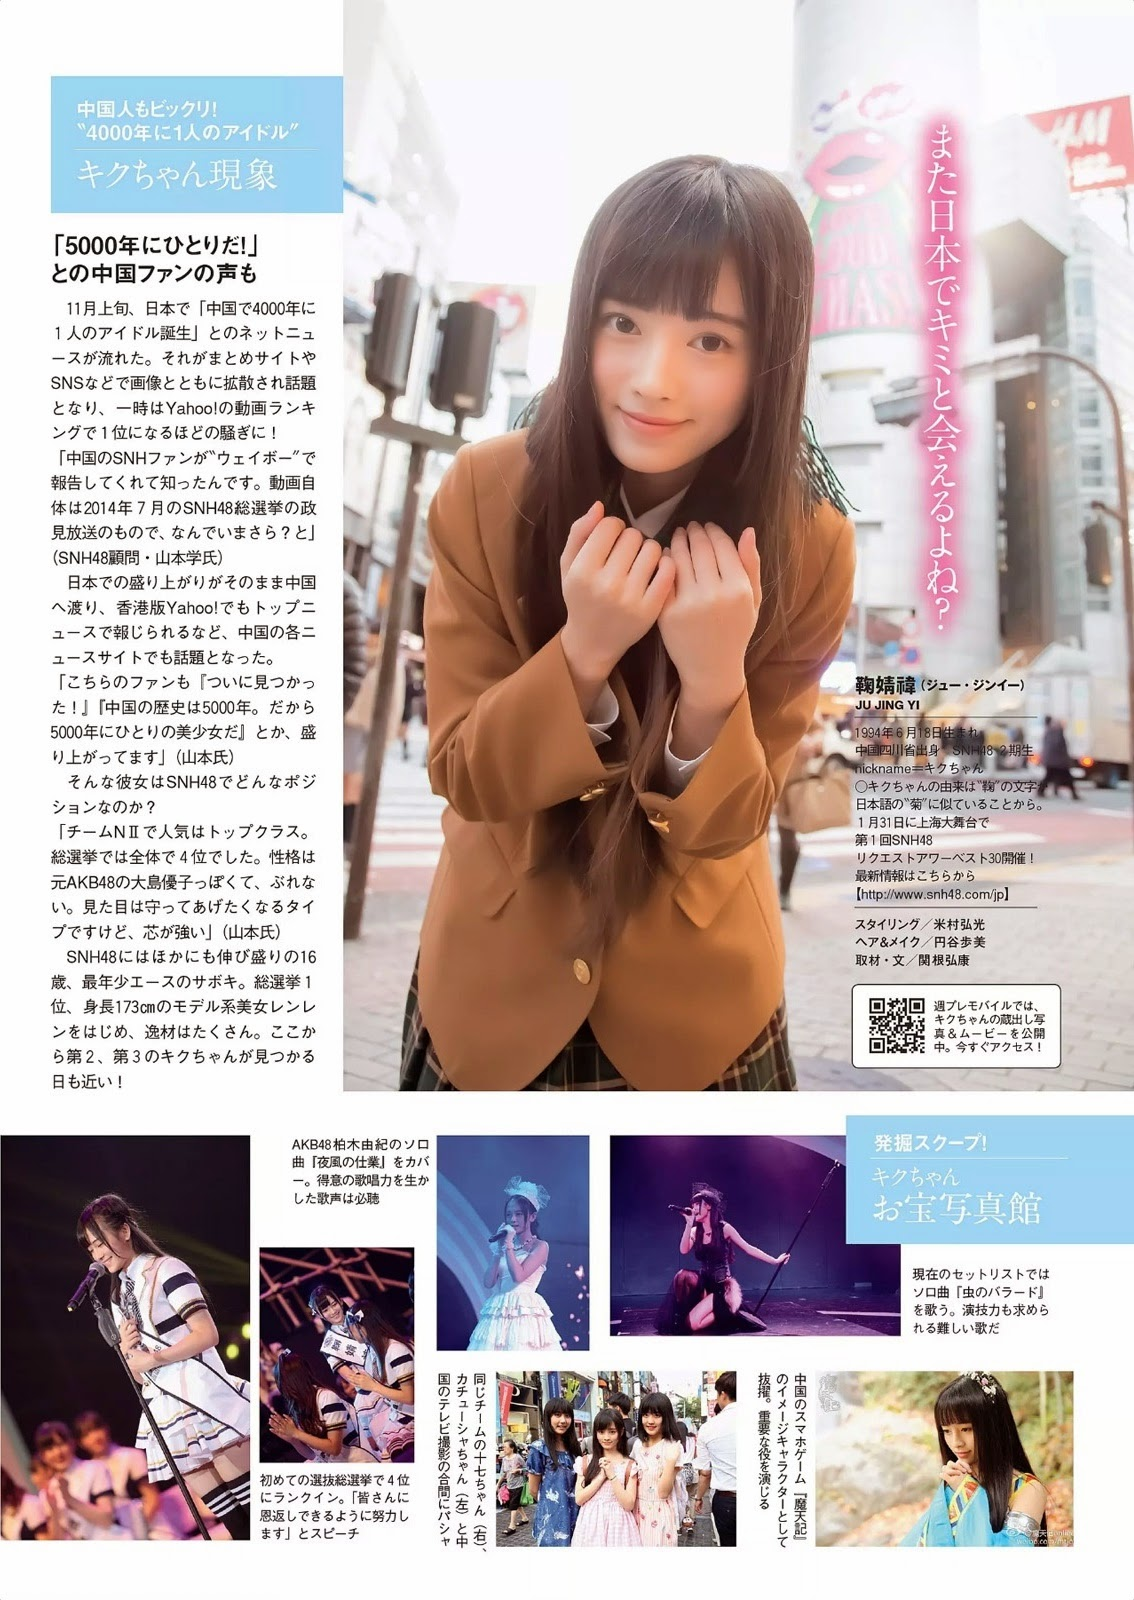 Ju Jingyi 鞠婧祎 Weekly Playboy No 5 2015 Photos 08